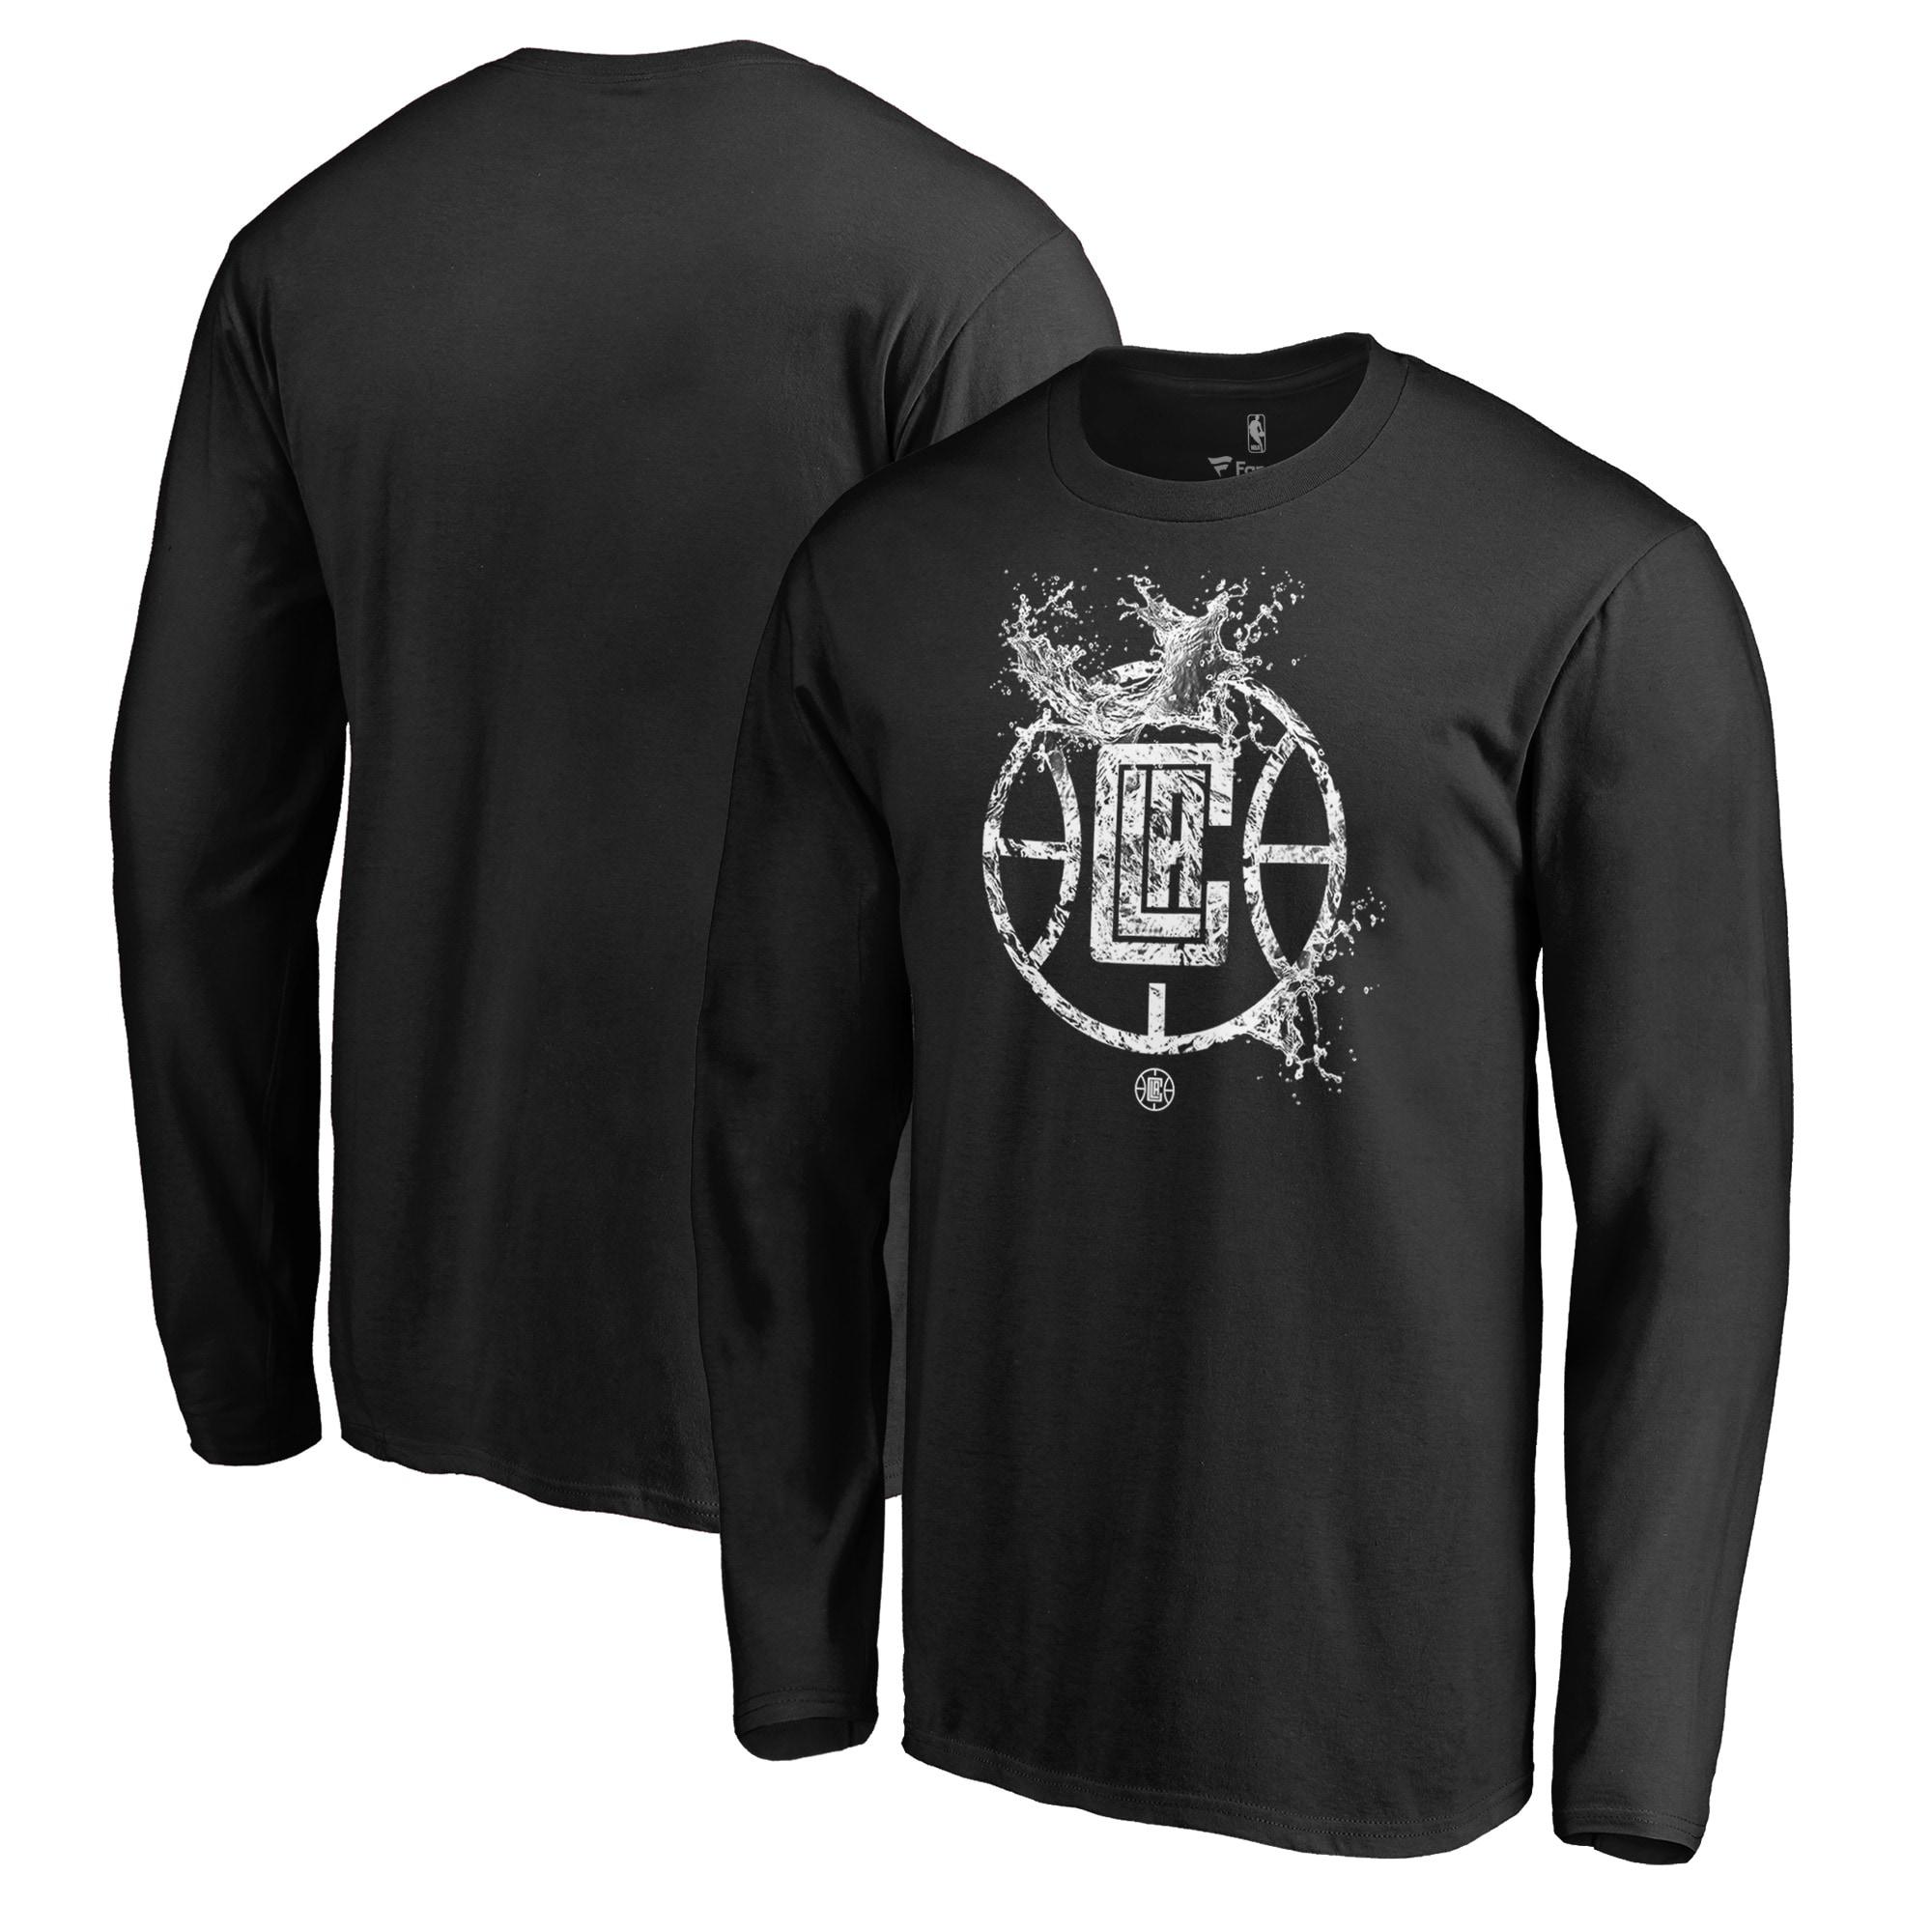 LA Clippers Fanatics Branded Splash Long Sleeve T-Shirt - Black